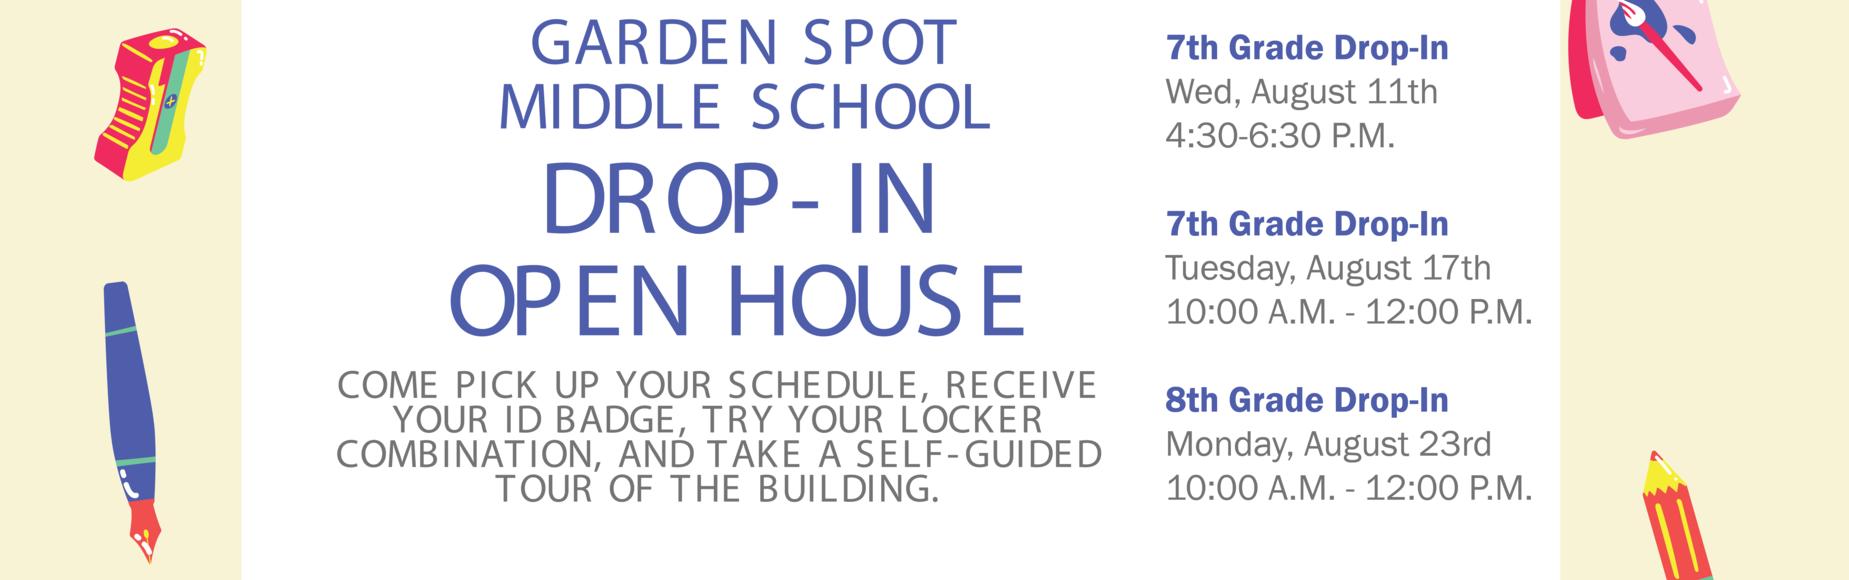 Garden Spot Middle School Open House Banner